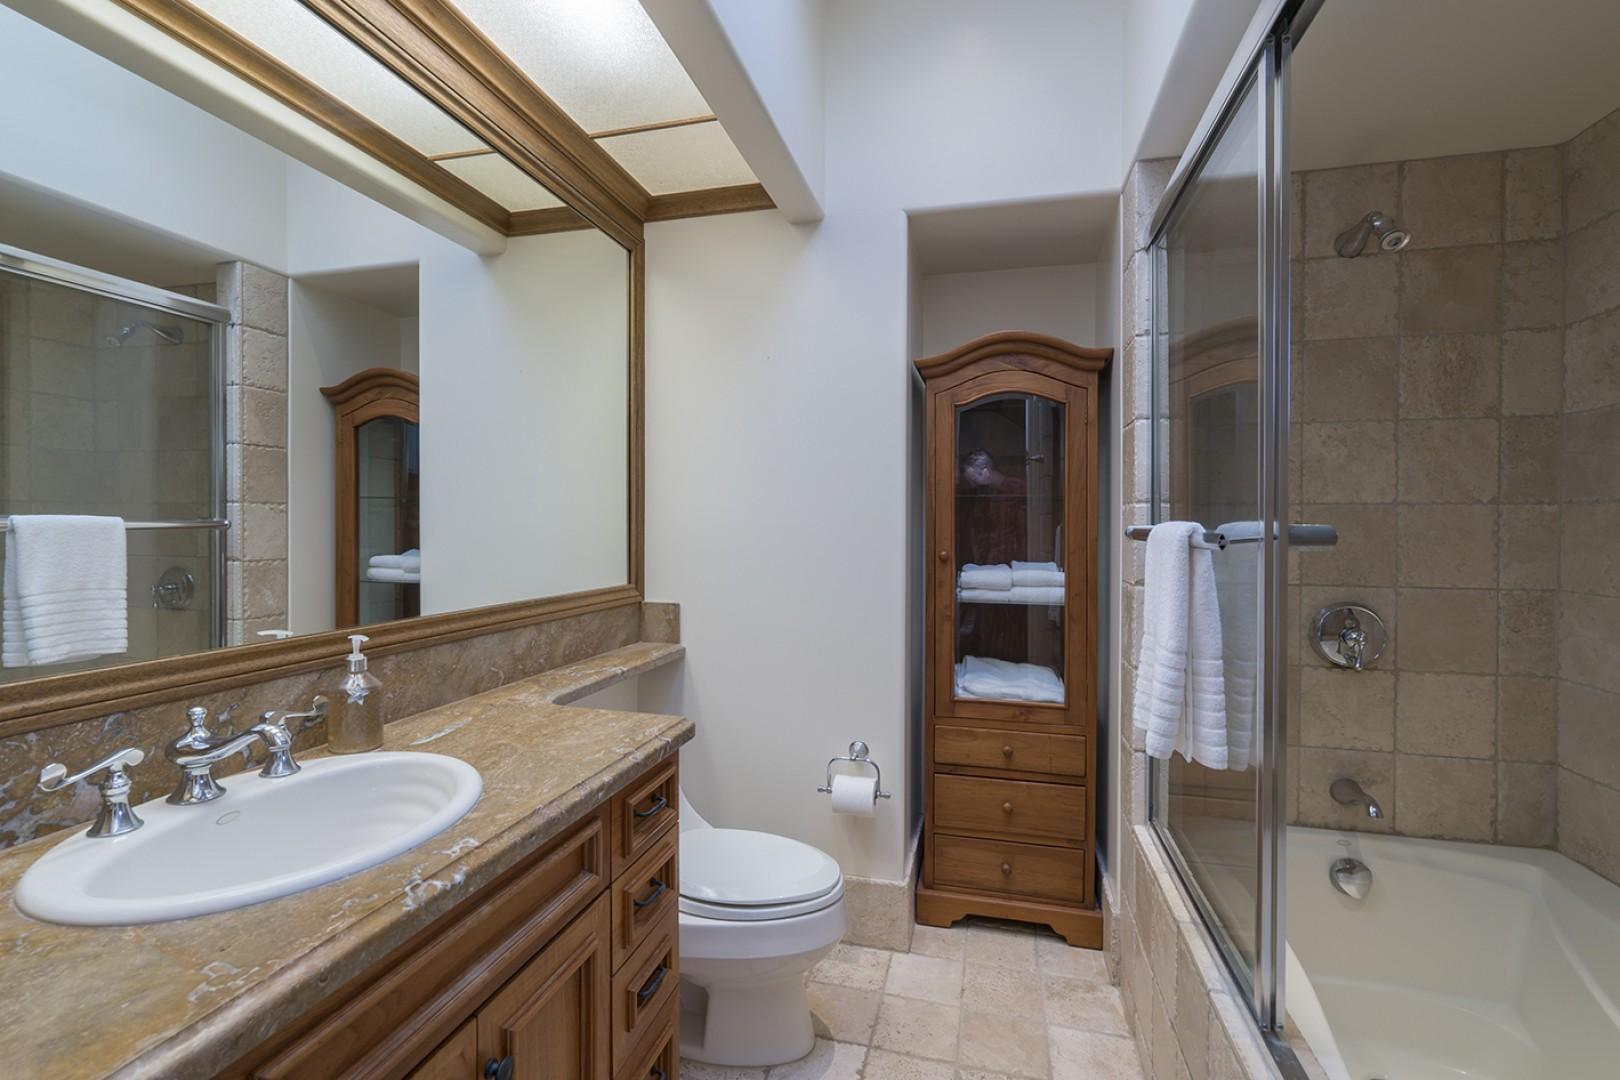 Guest house: Guest Bedroom 3 ensuite bathroom.